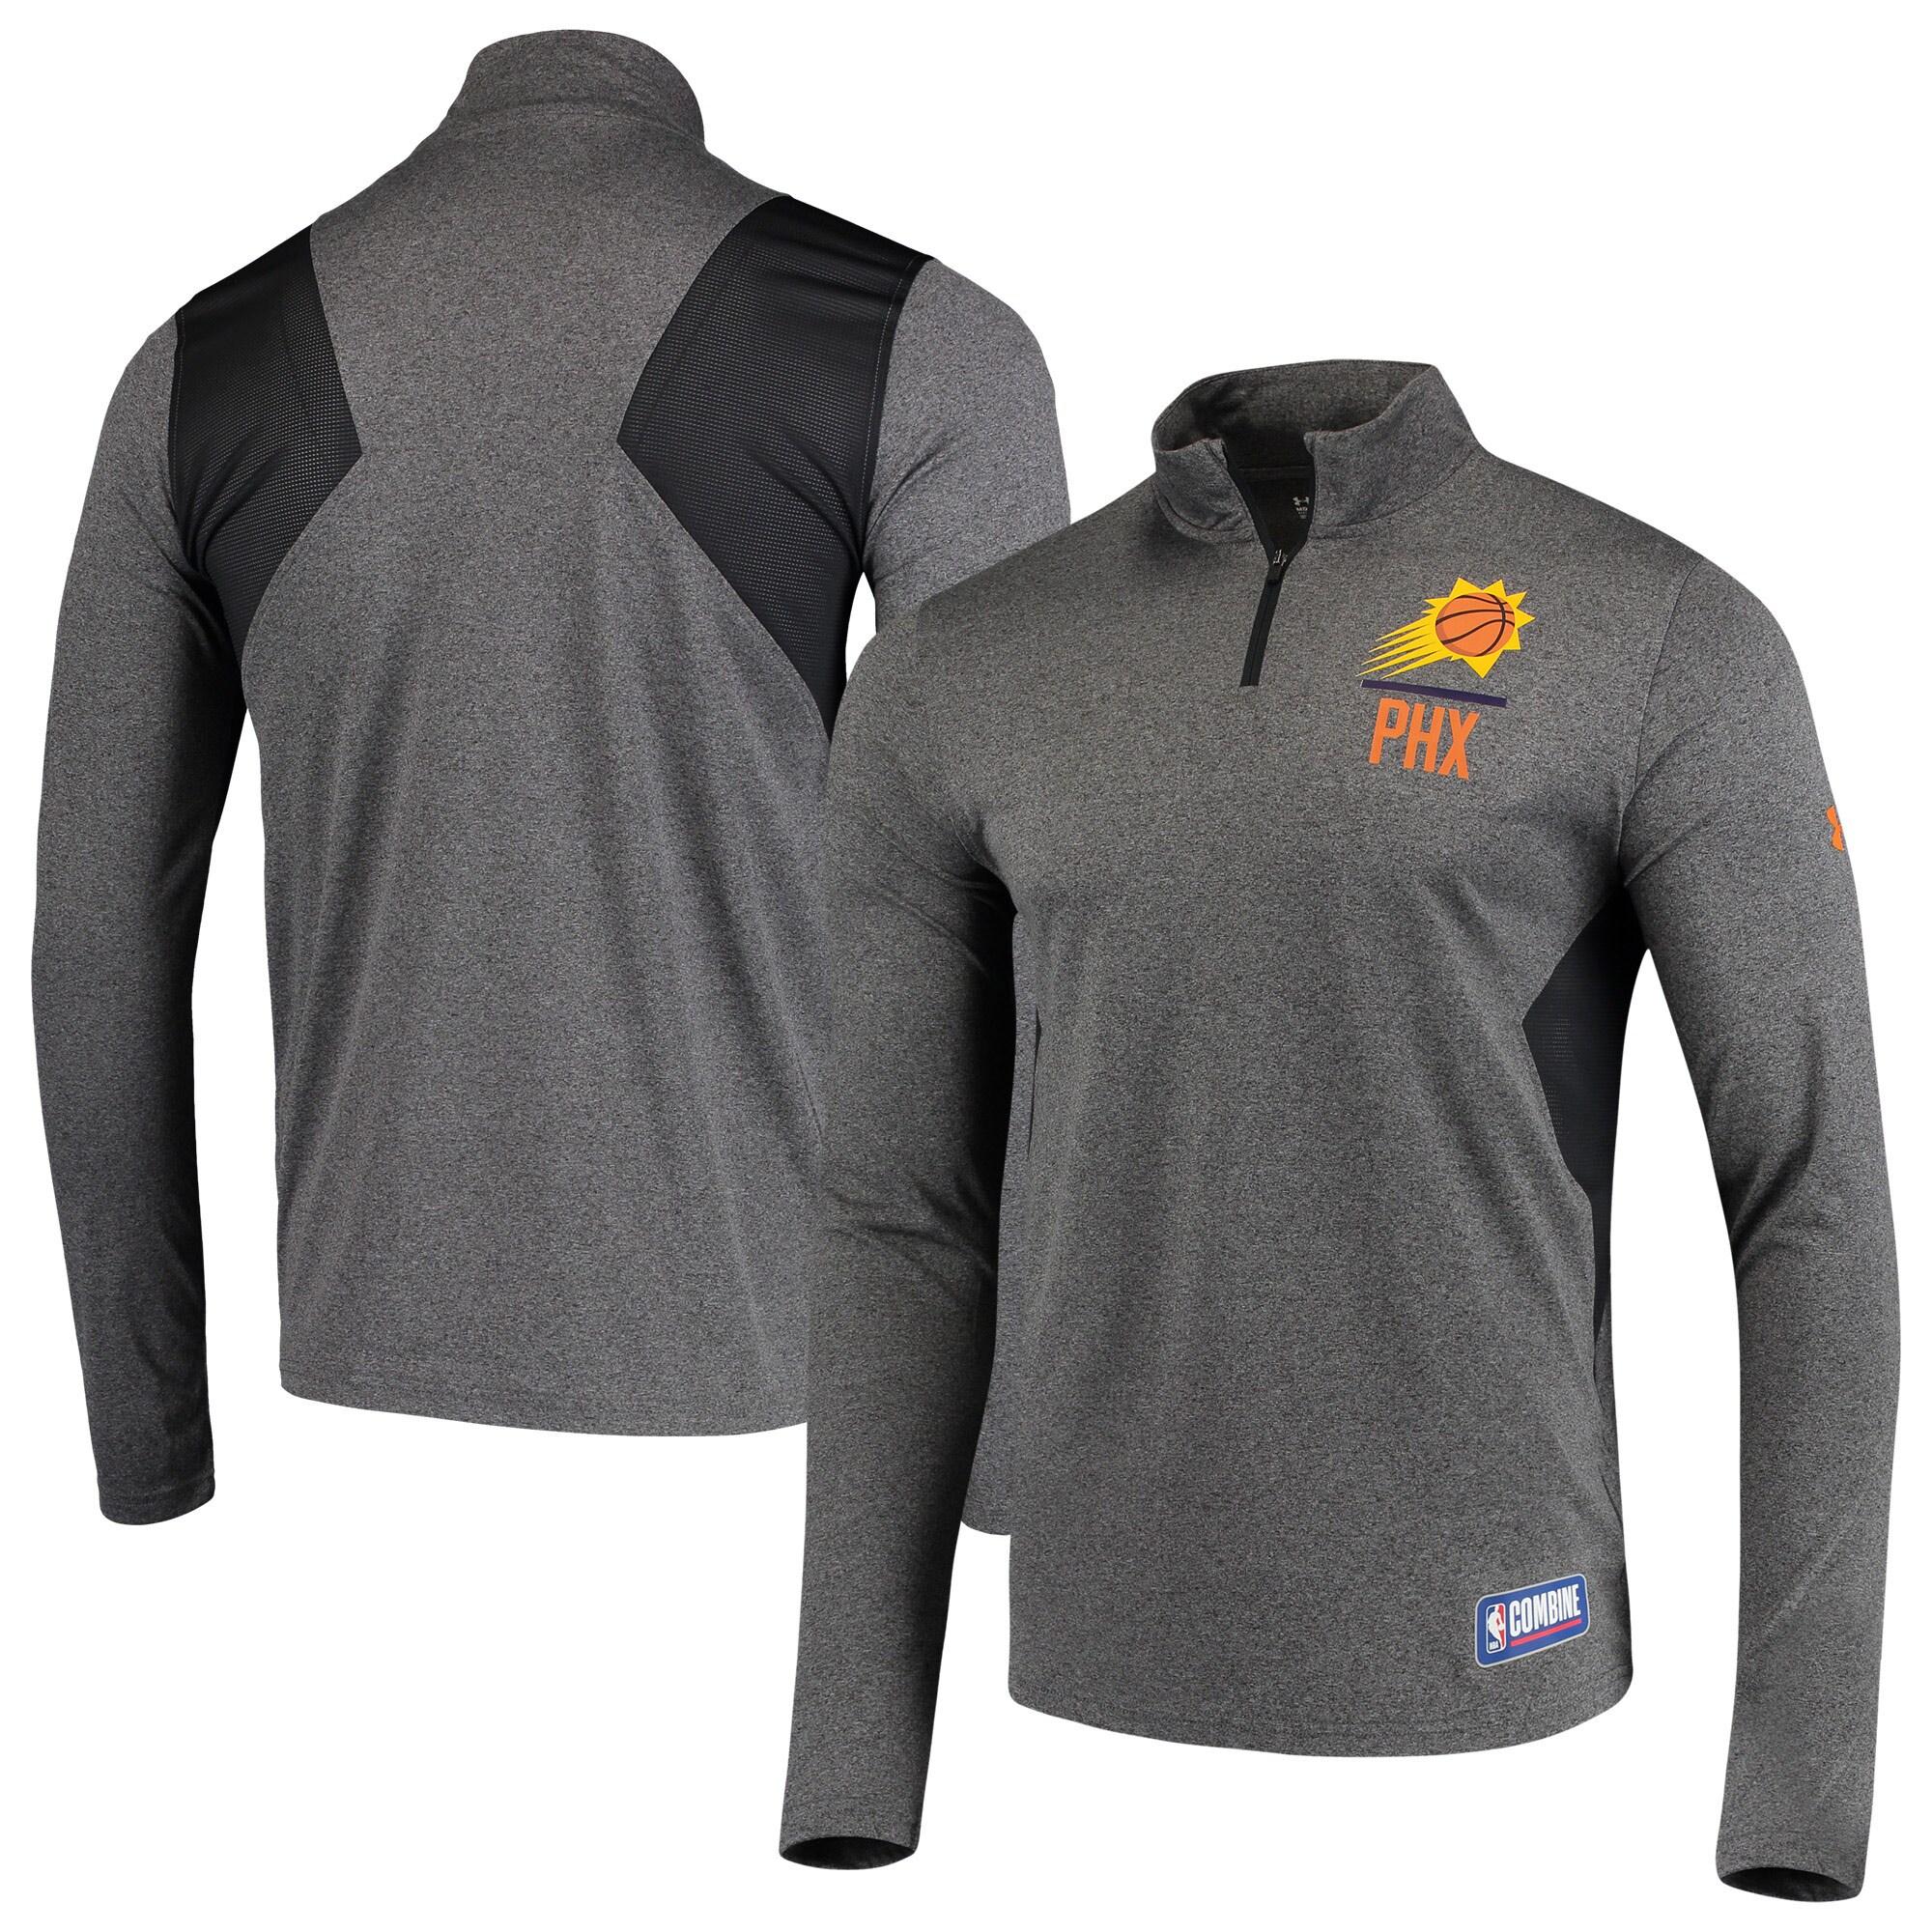 Phoenix Suns Under Armour Combine Authentic Season Tech Quarter-Zip Pullover Jacket - Heathered Charcoal